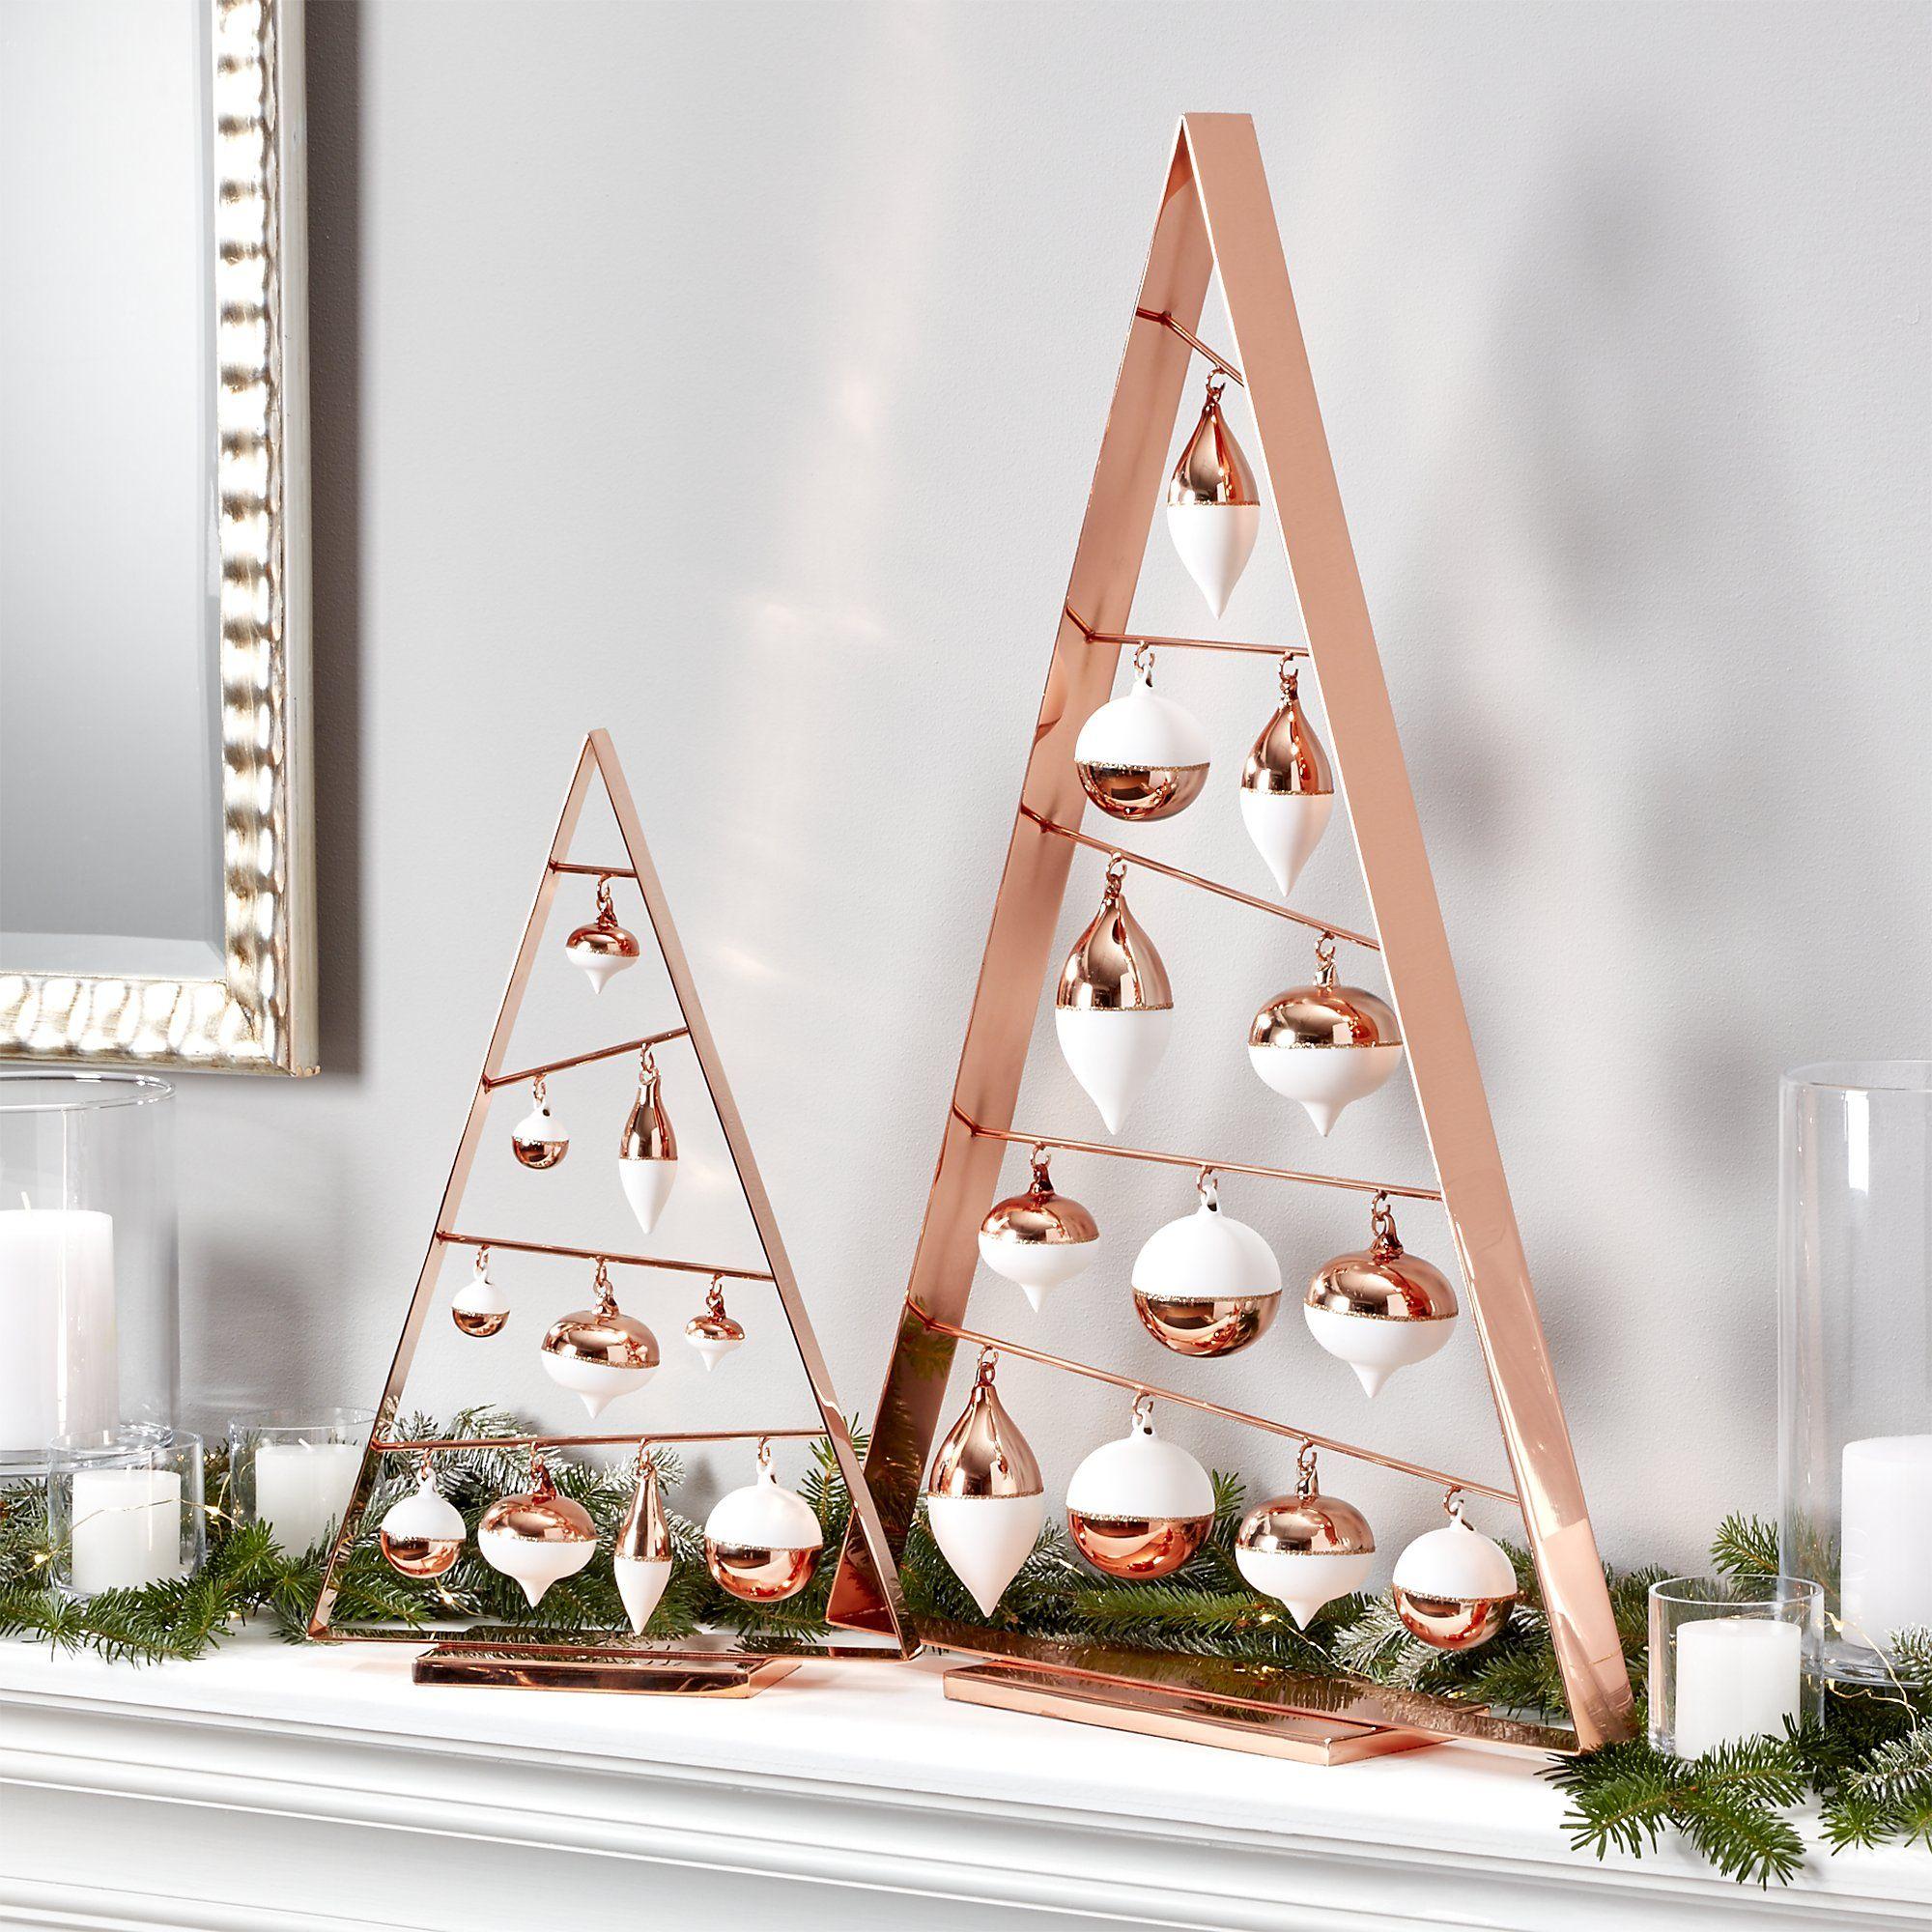 A Frame Copper Ornament Trees Crate And Barrel